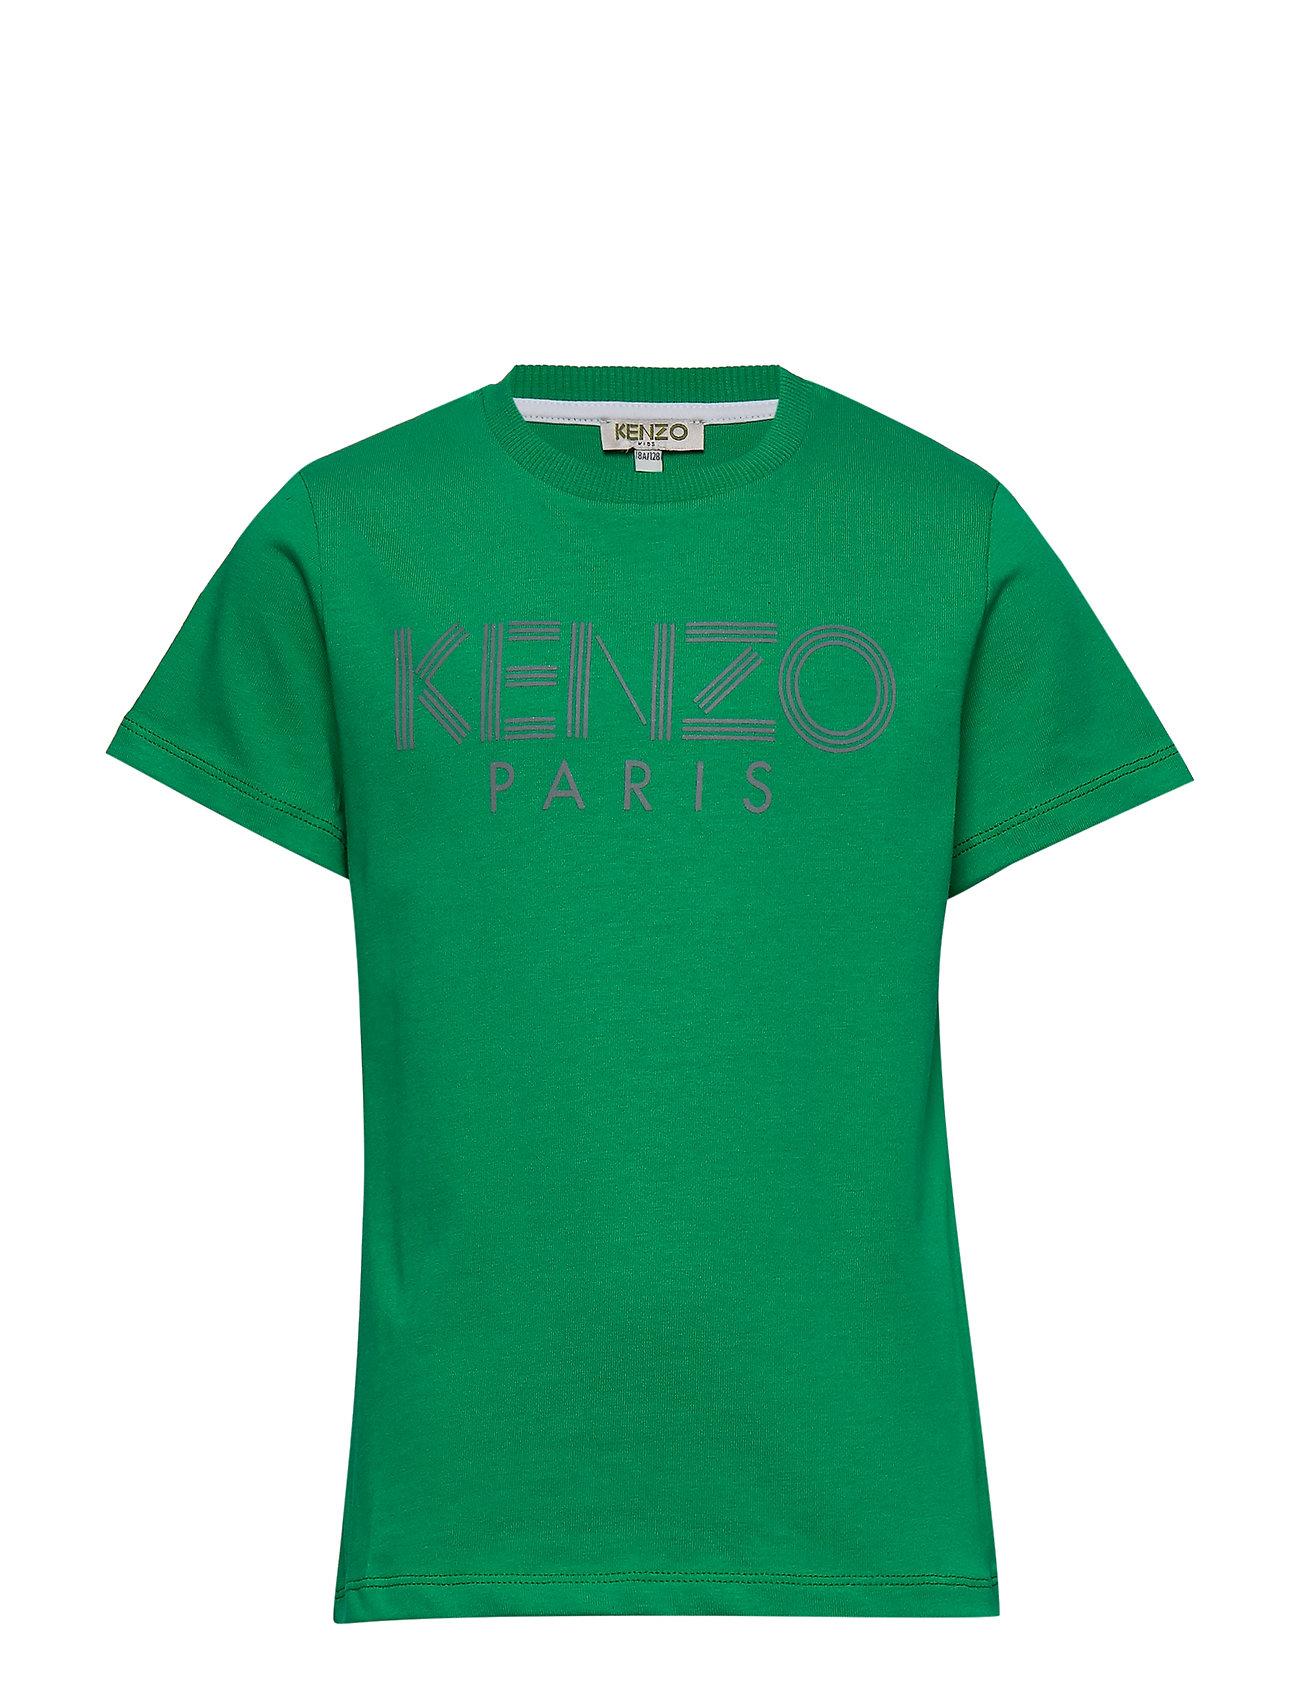 Kenzo LOGO JB 3 - GREEN